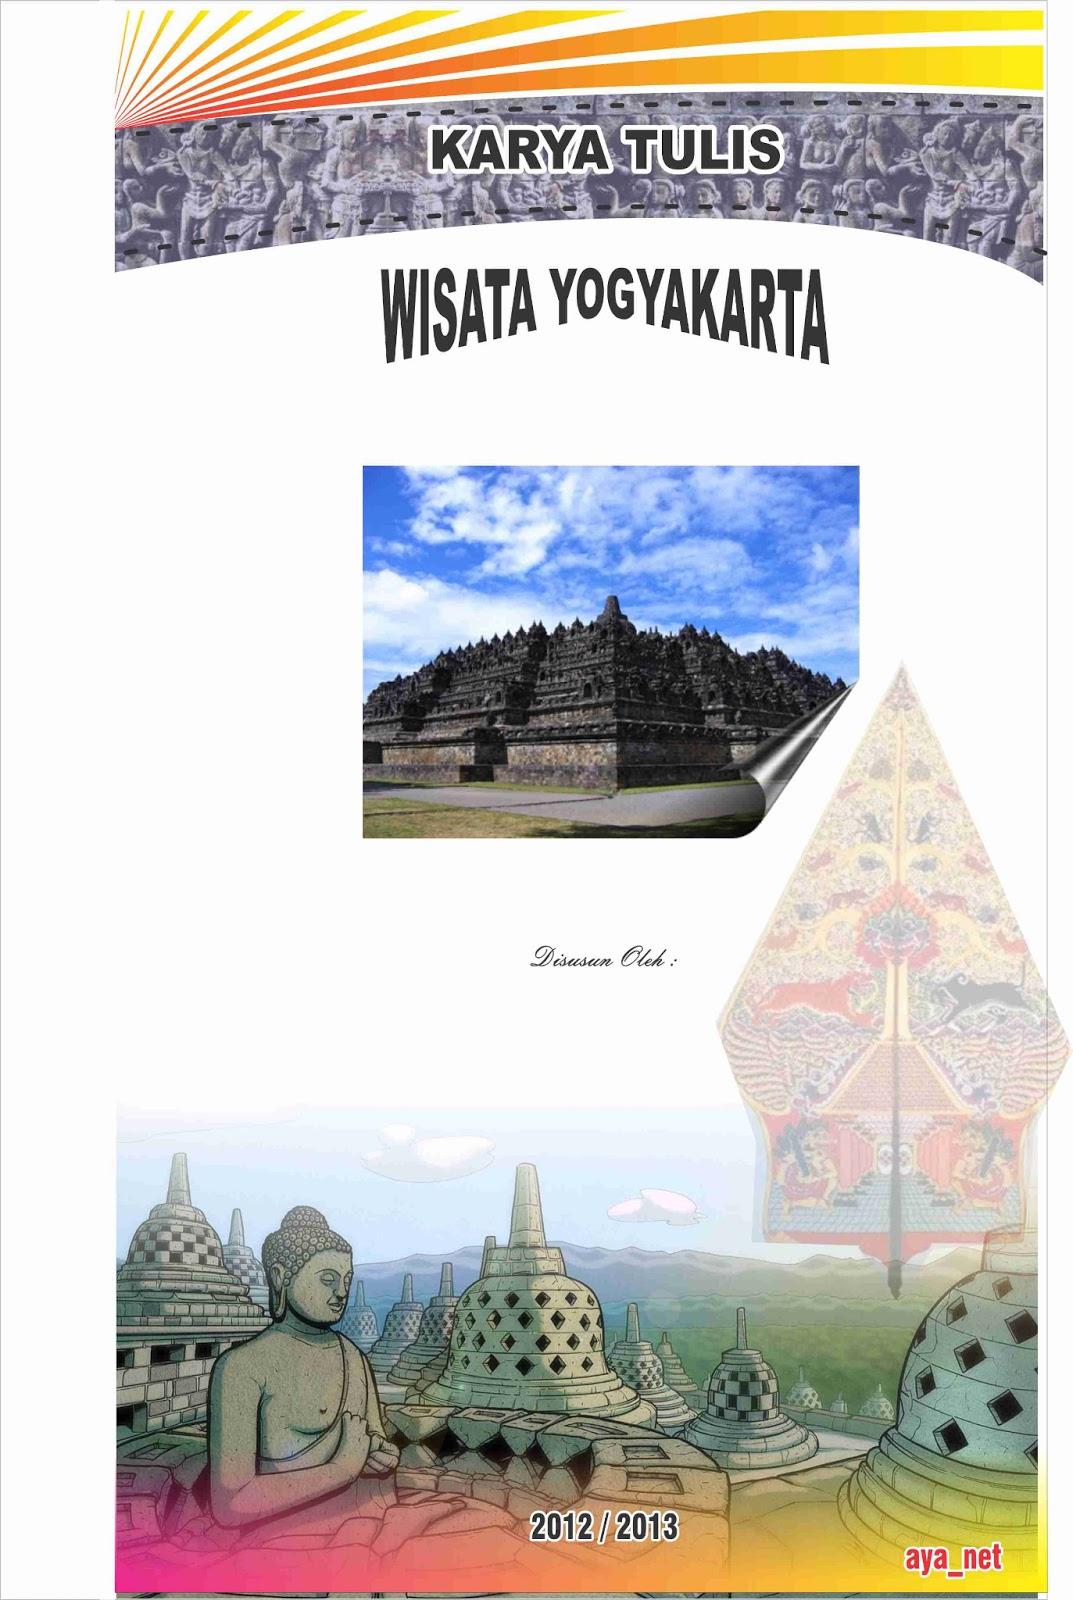 Makalah Wisata Yogyakarta Candi Boro Budur Aneka Apa Aja